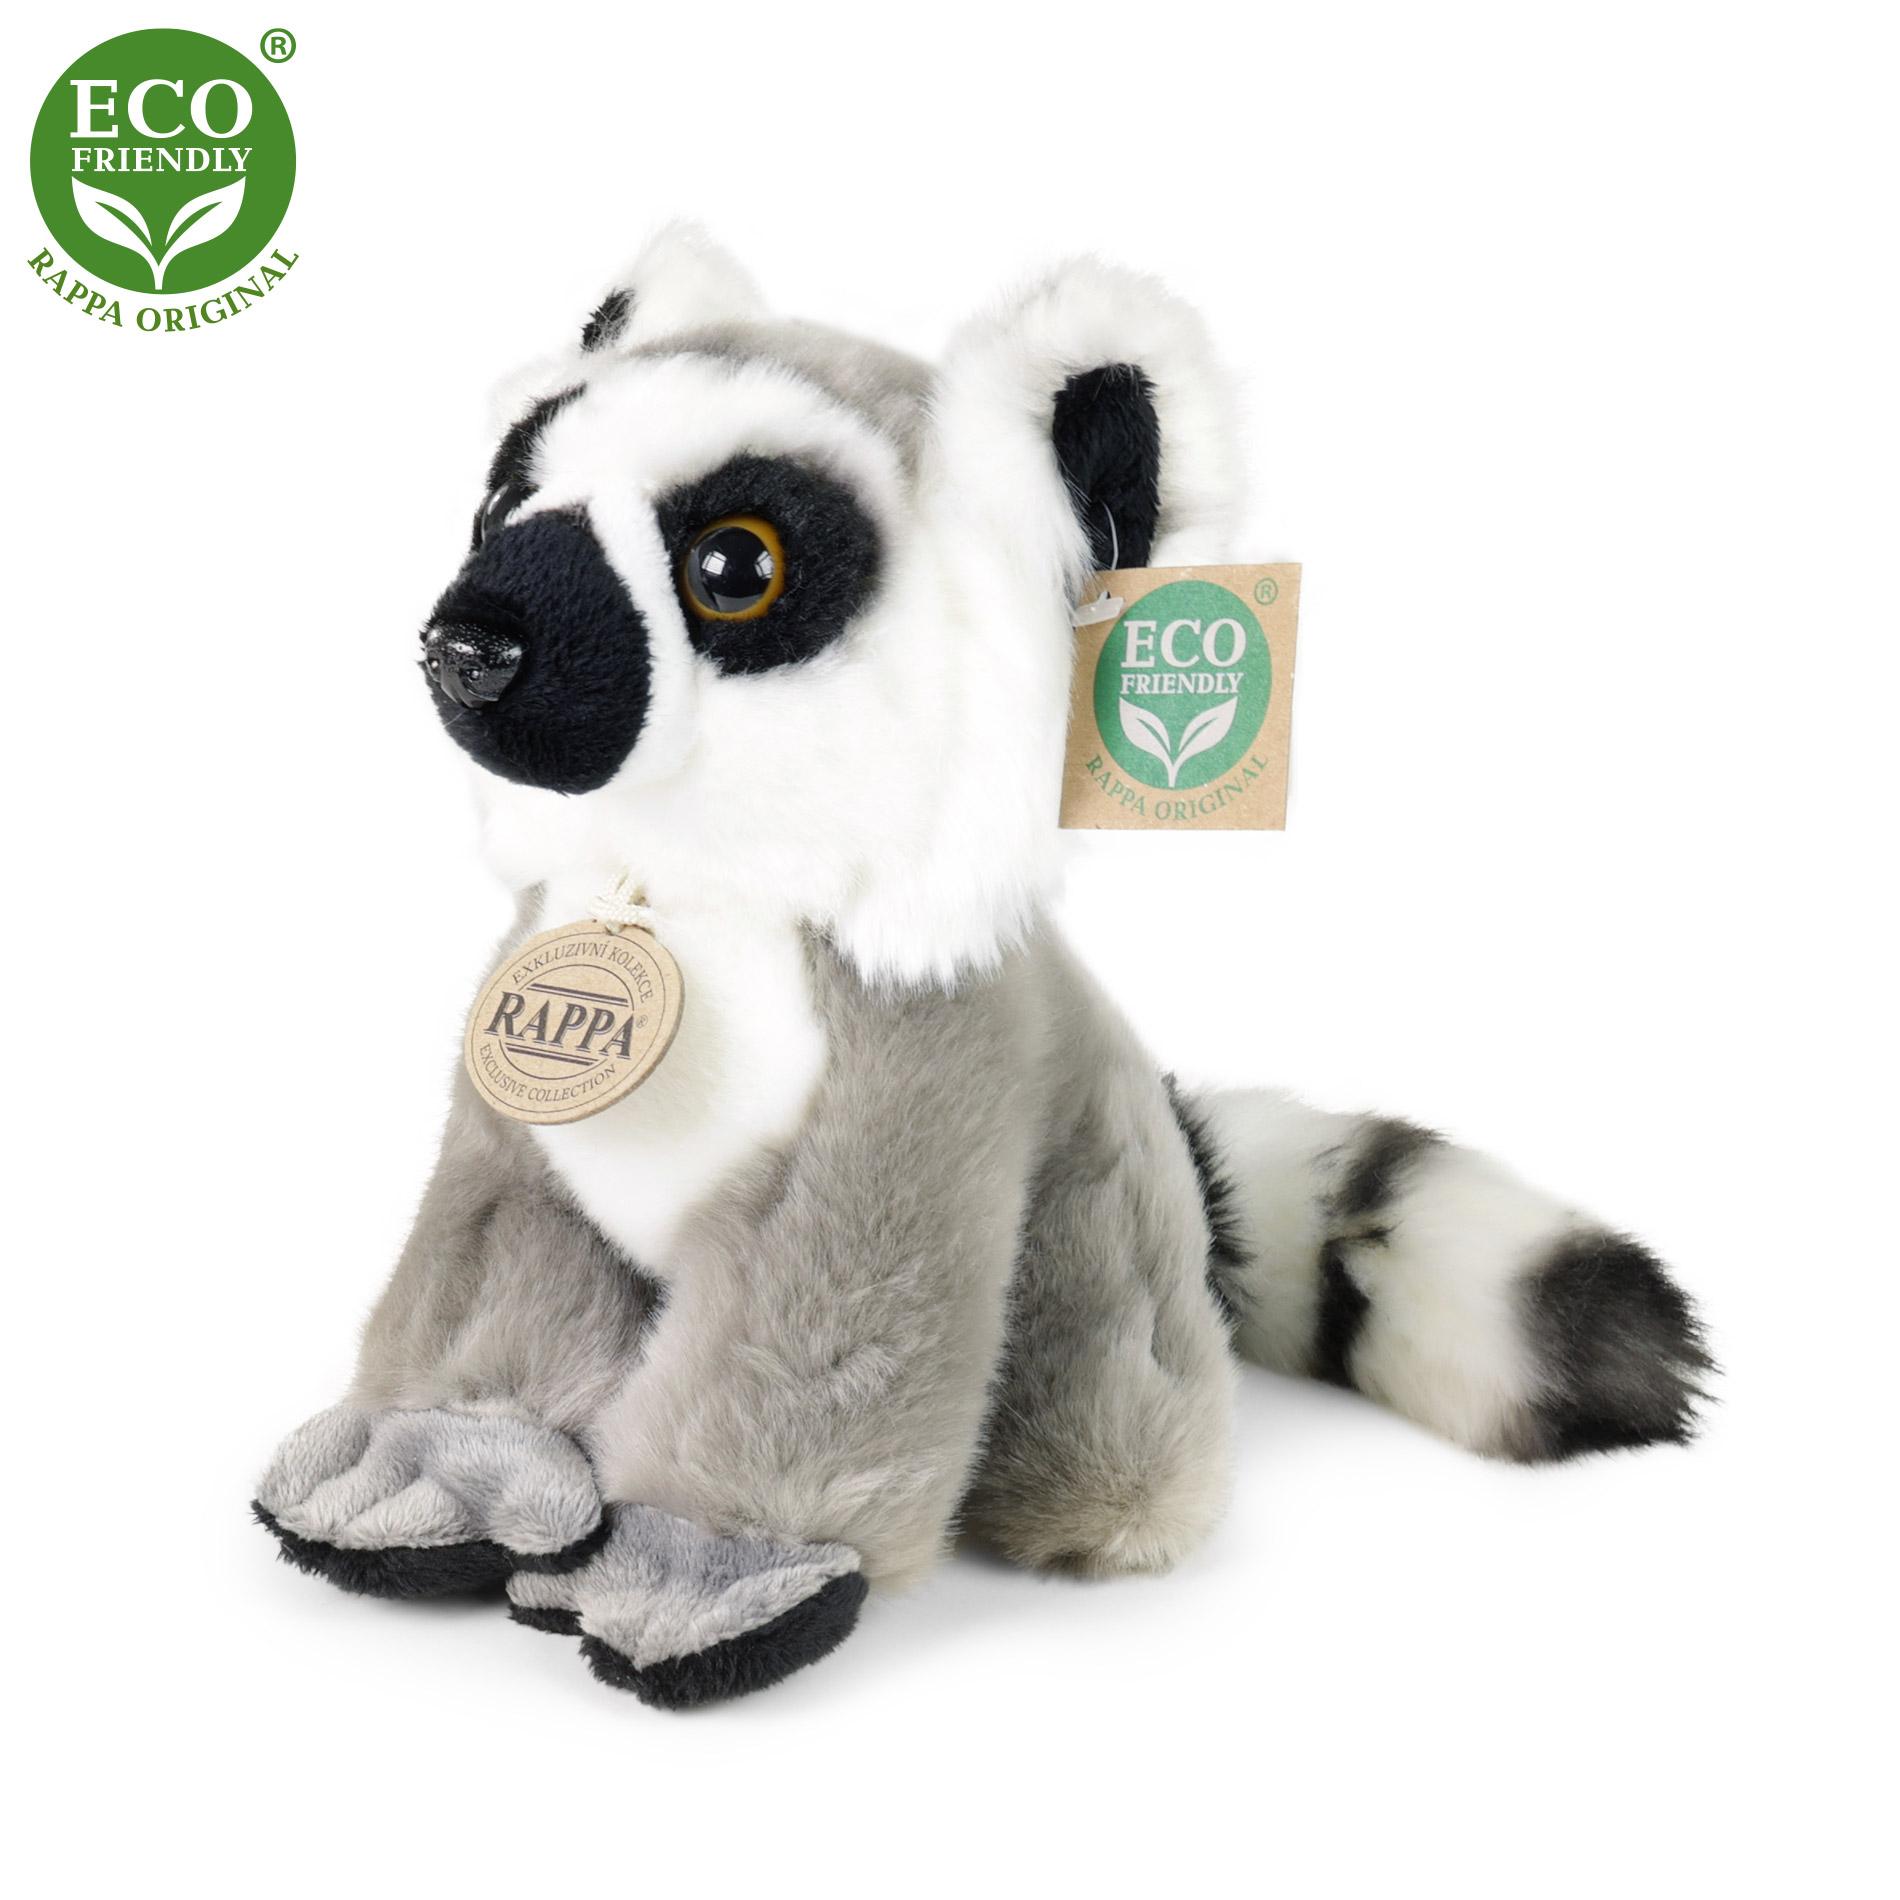 plyšový lemur sediaci, 18 cm